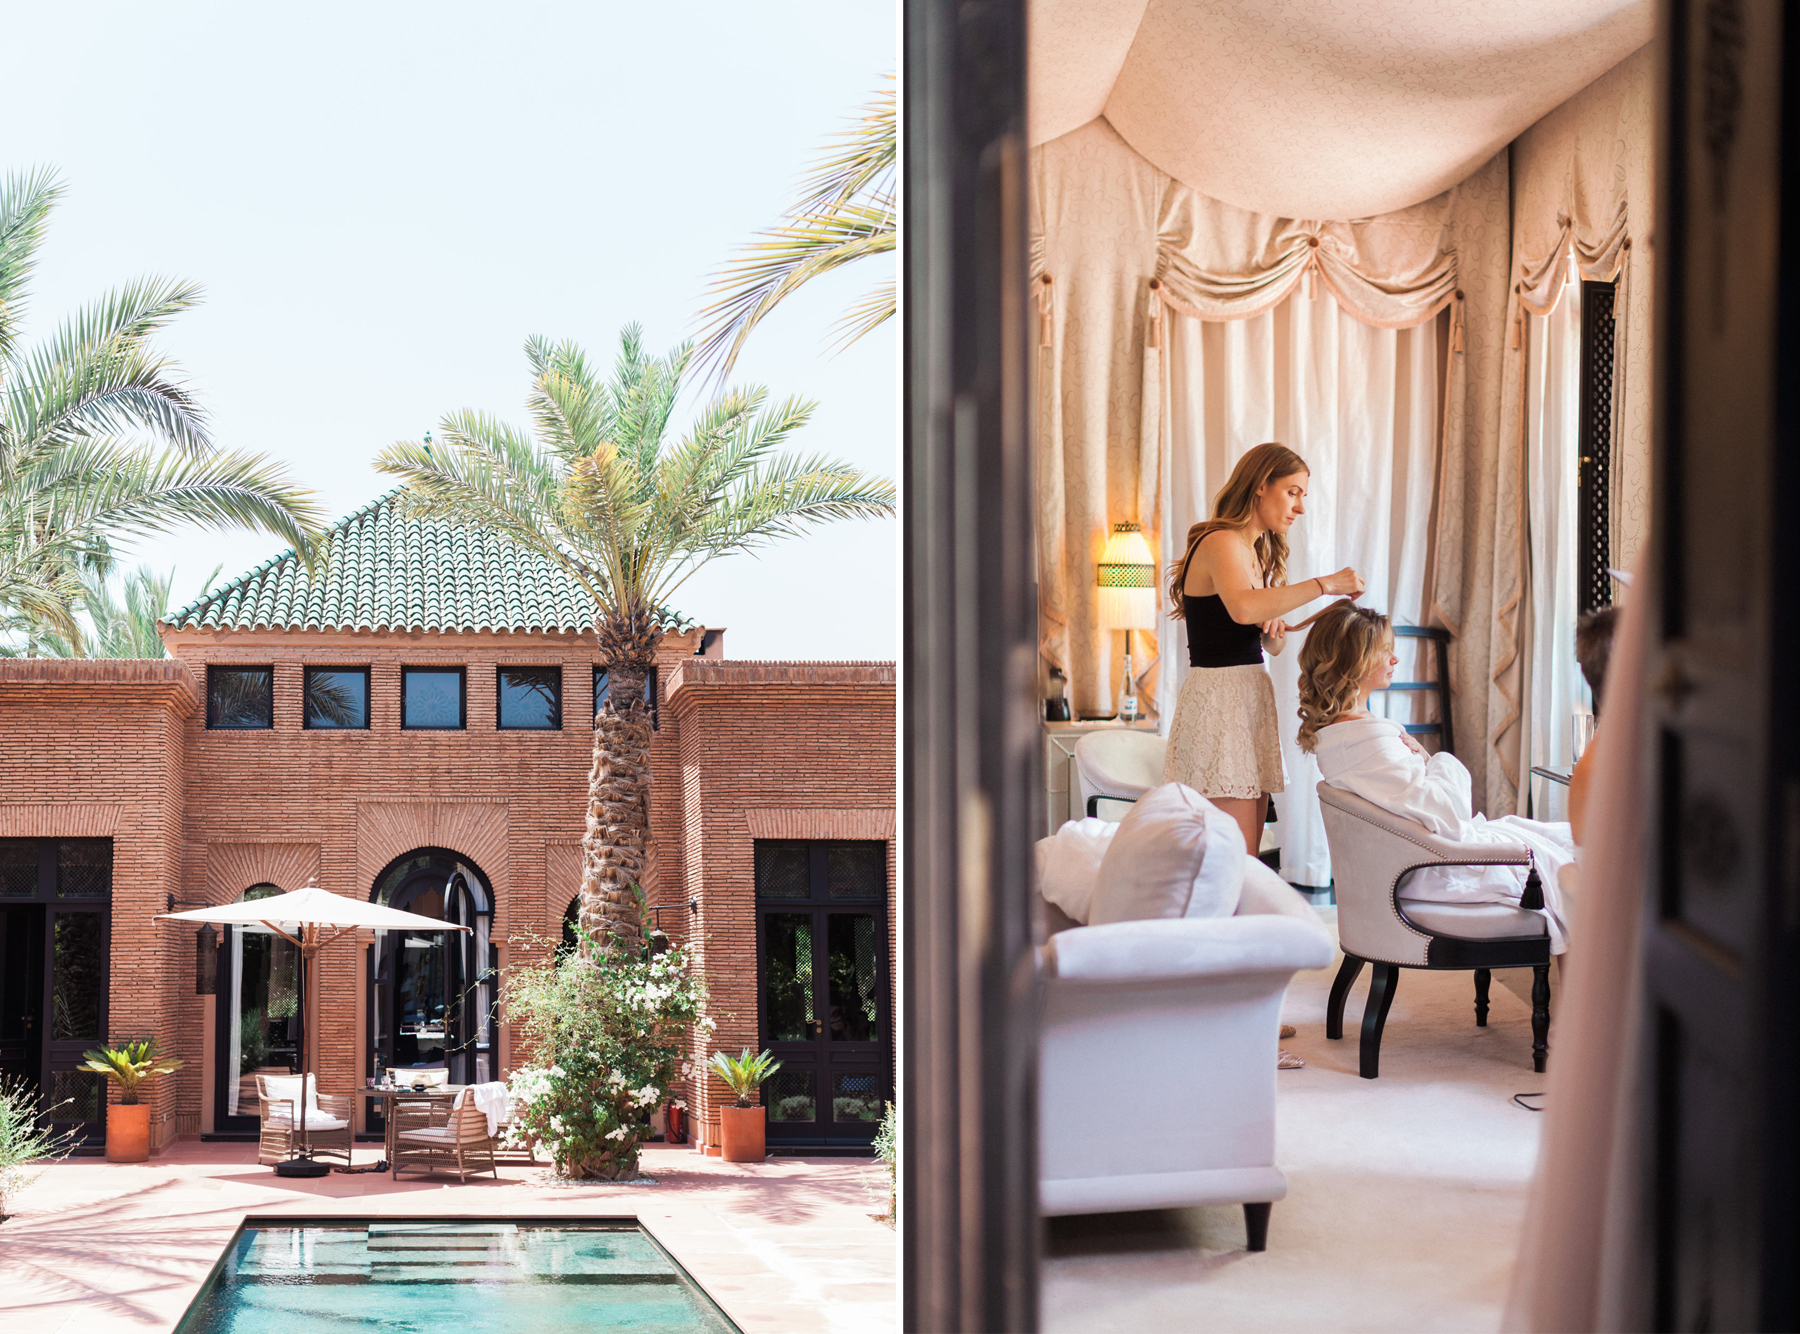 mariarao_marrakechwedding-27-33 web.jpg